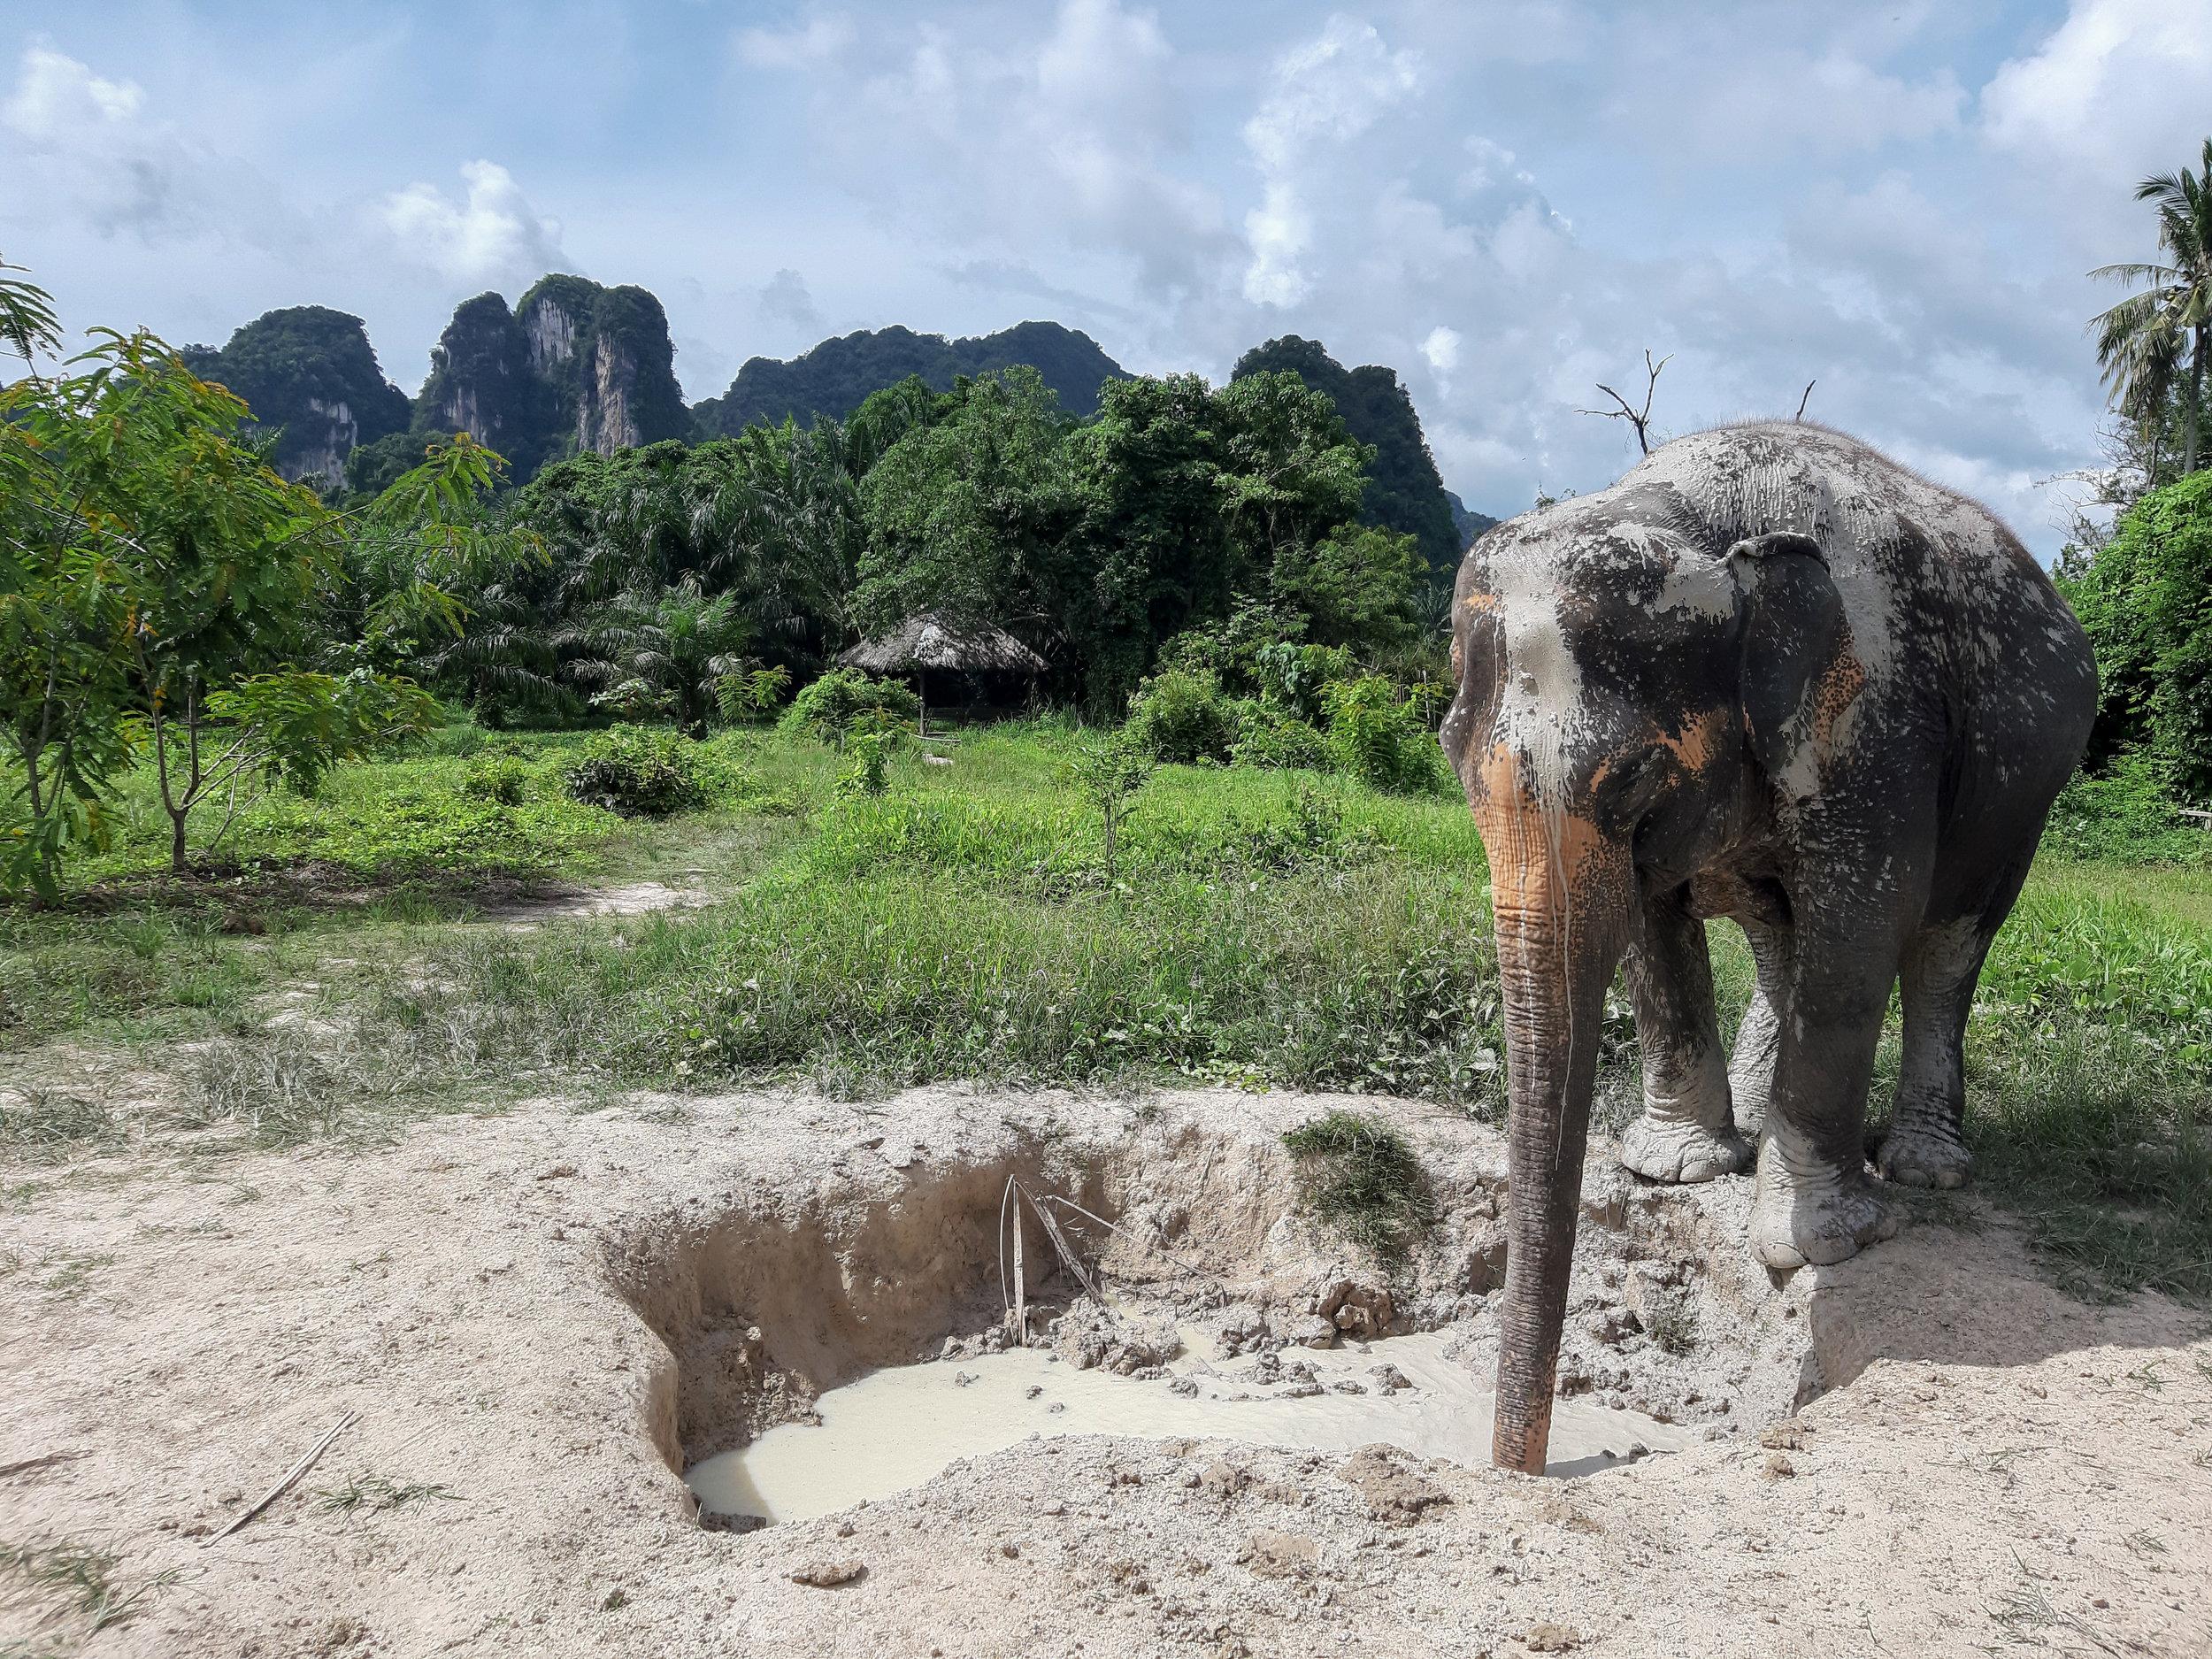 elephant-mud-bath-thailand-krabi_1.jpg